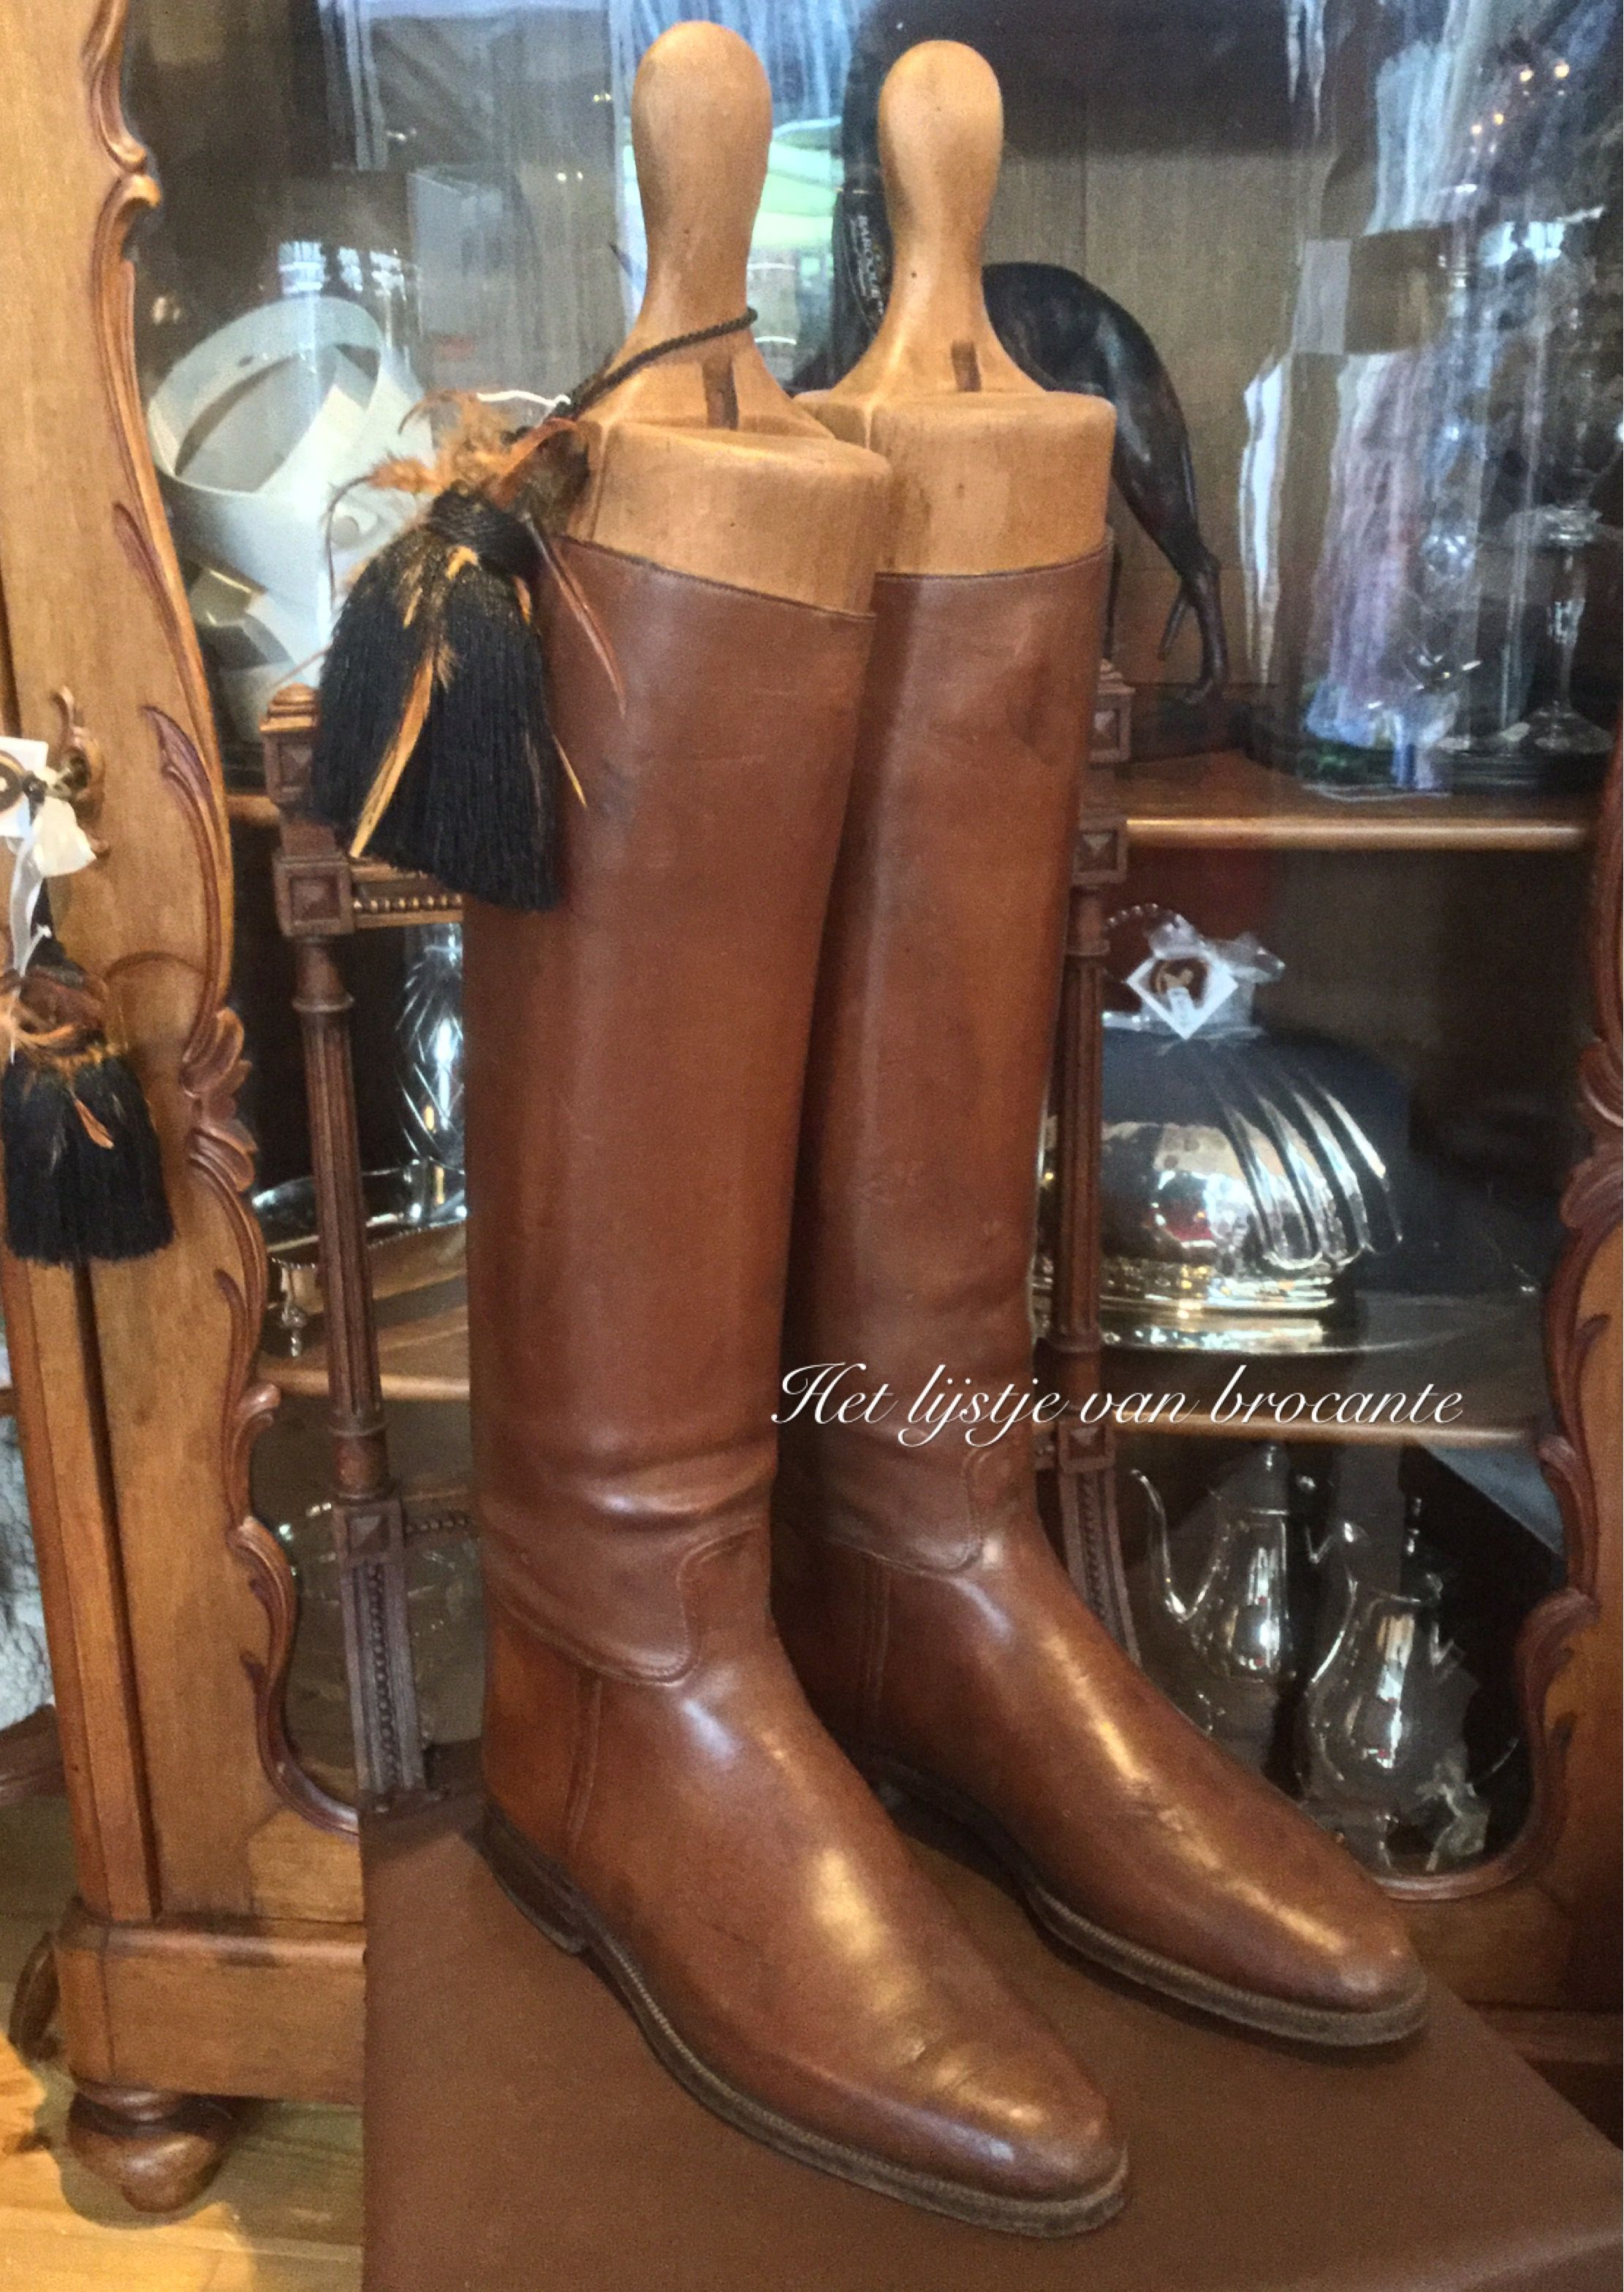 English Riding Boots For Sale In My Shop By Silvia Hokke Rijlaars Laarzen Antiek